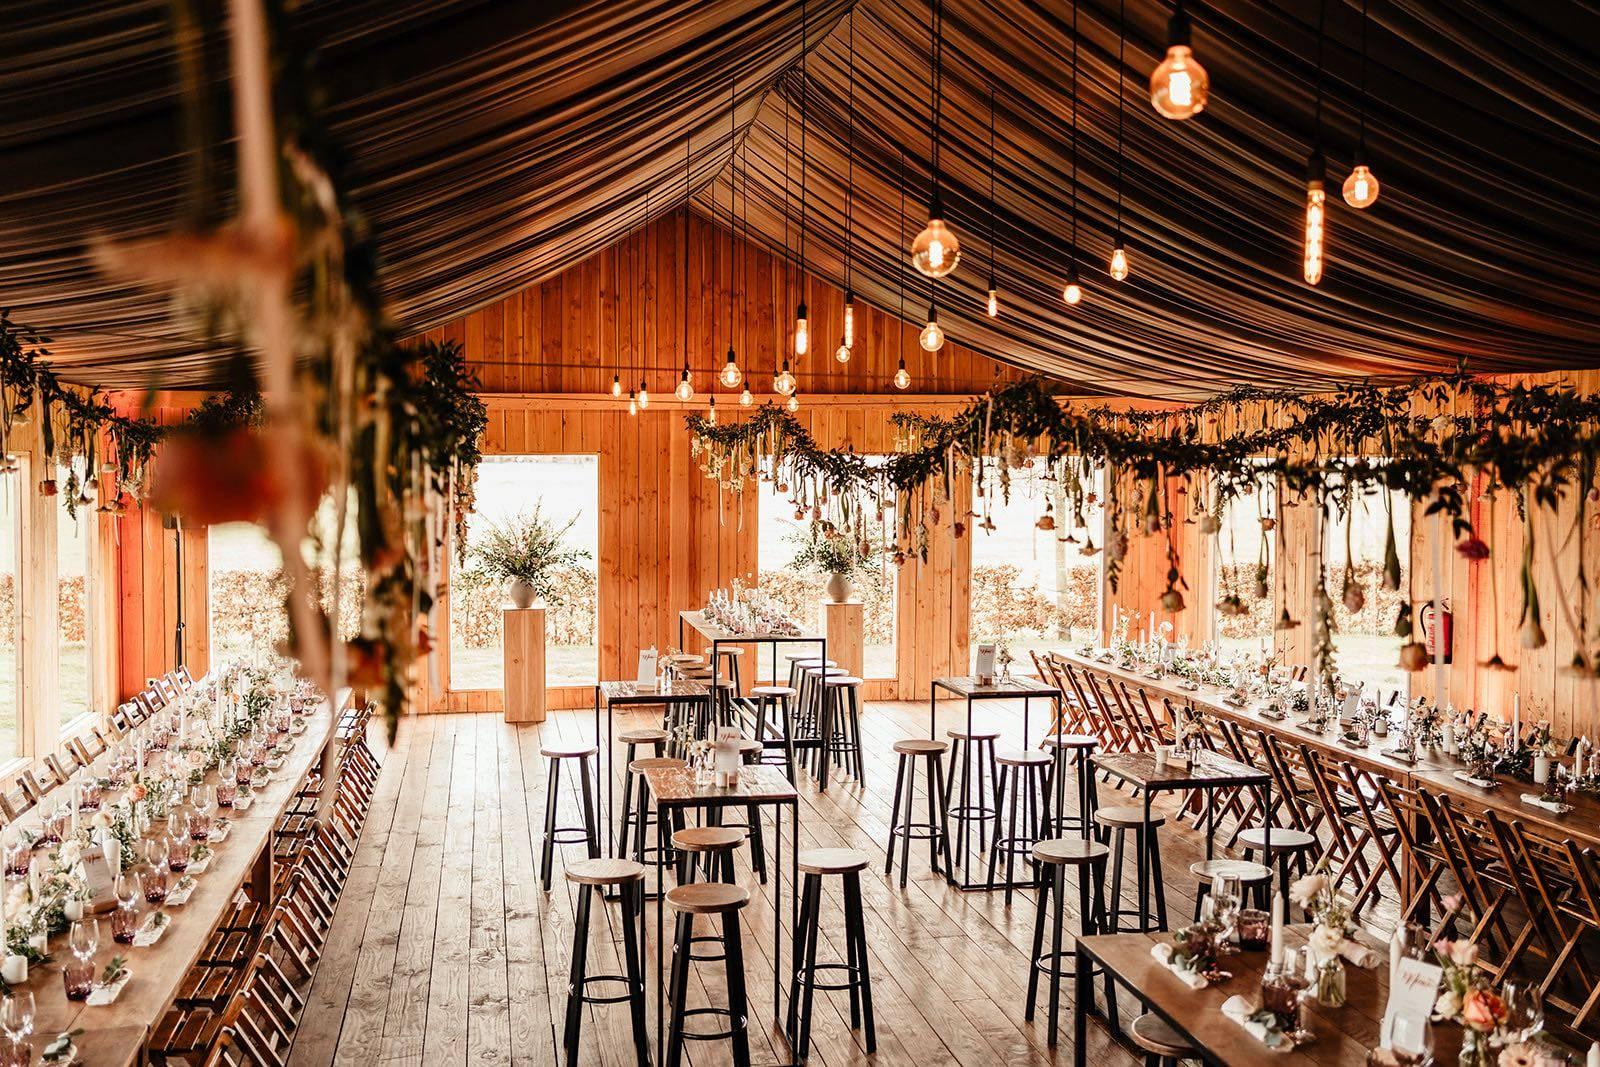 Maison Fleurie - Fotograaf zelfgetrokken - House of Weddings - 10